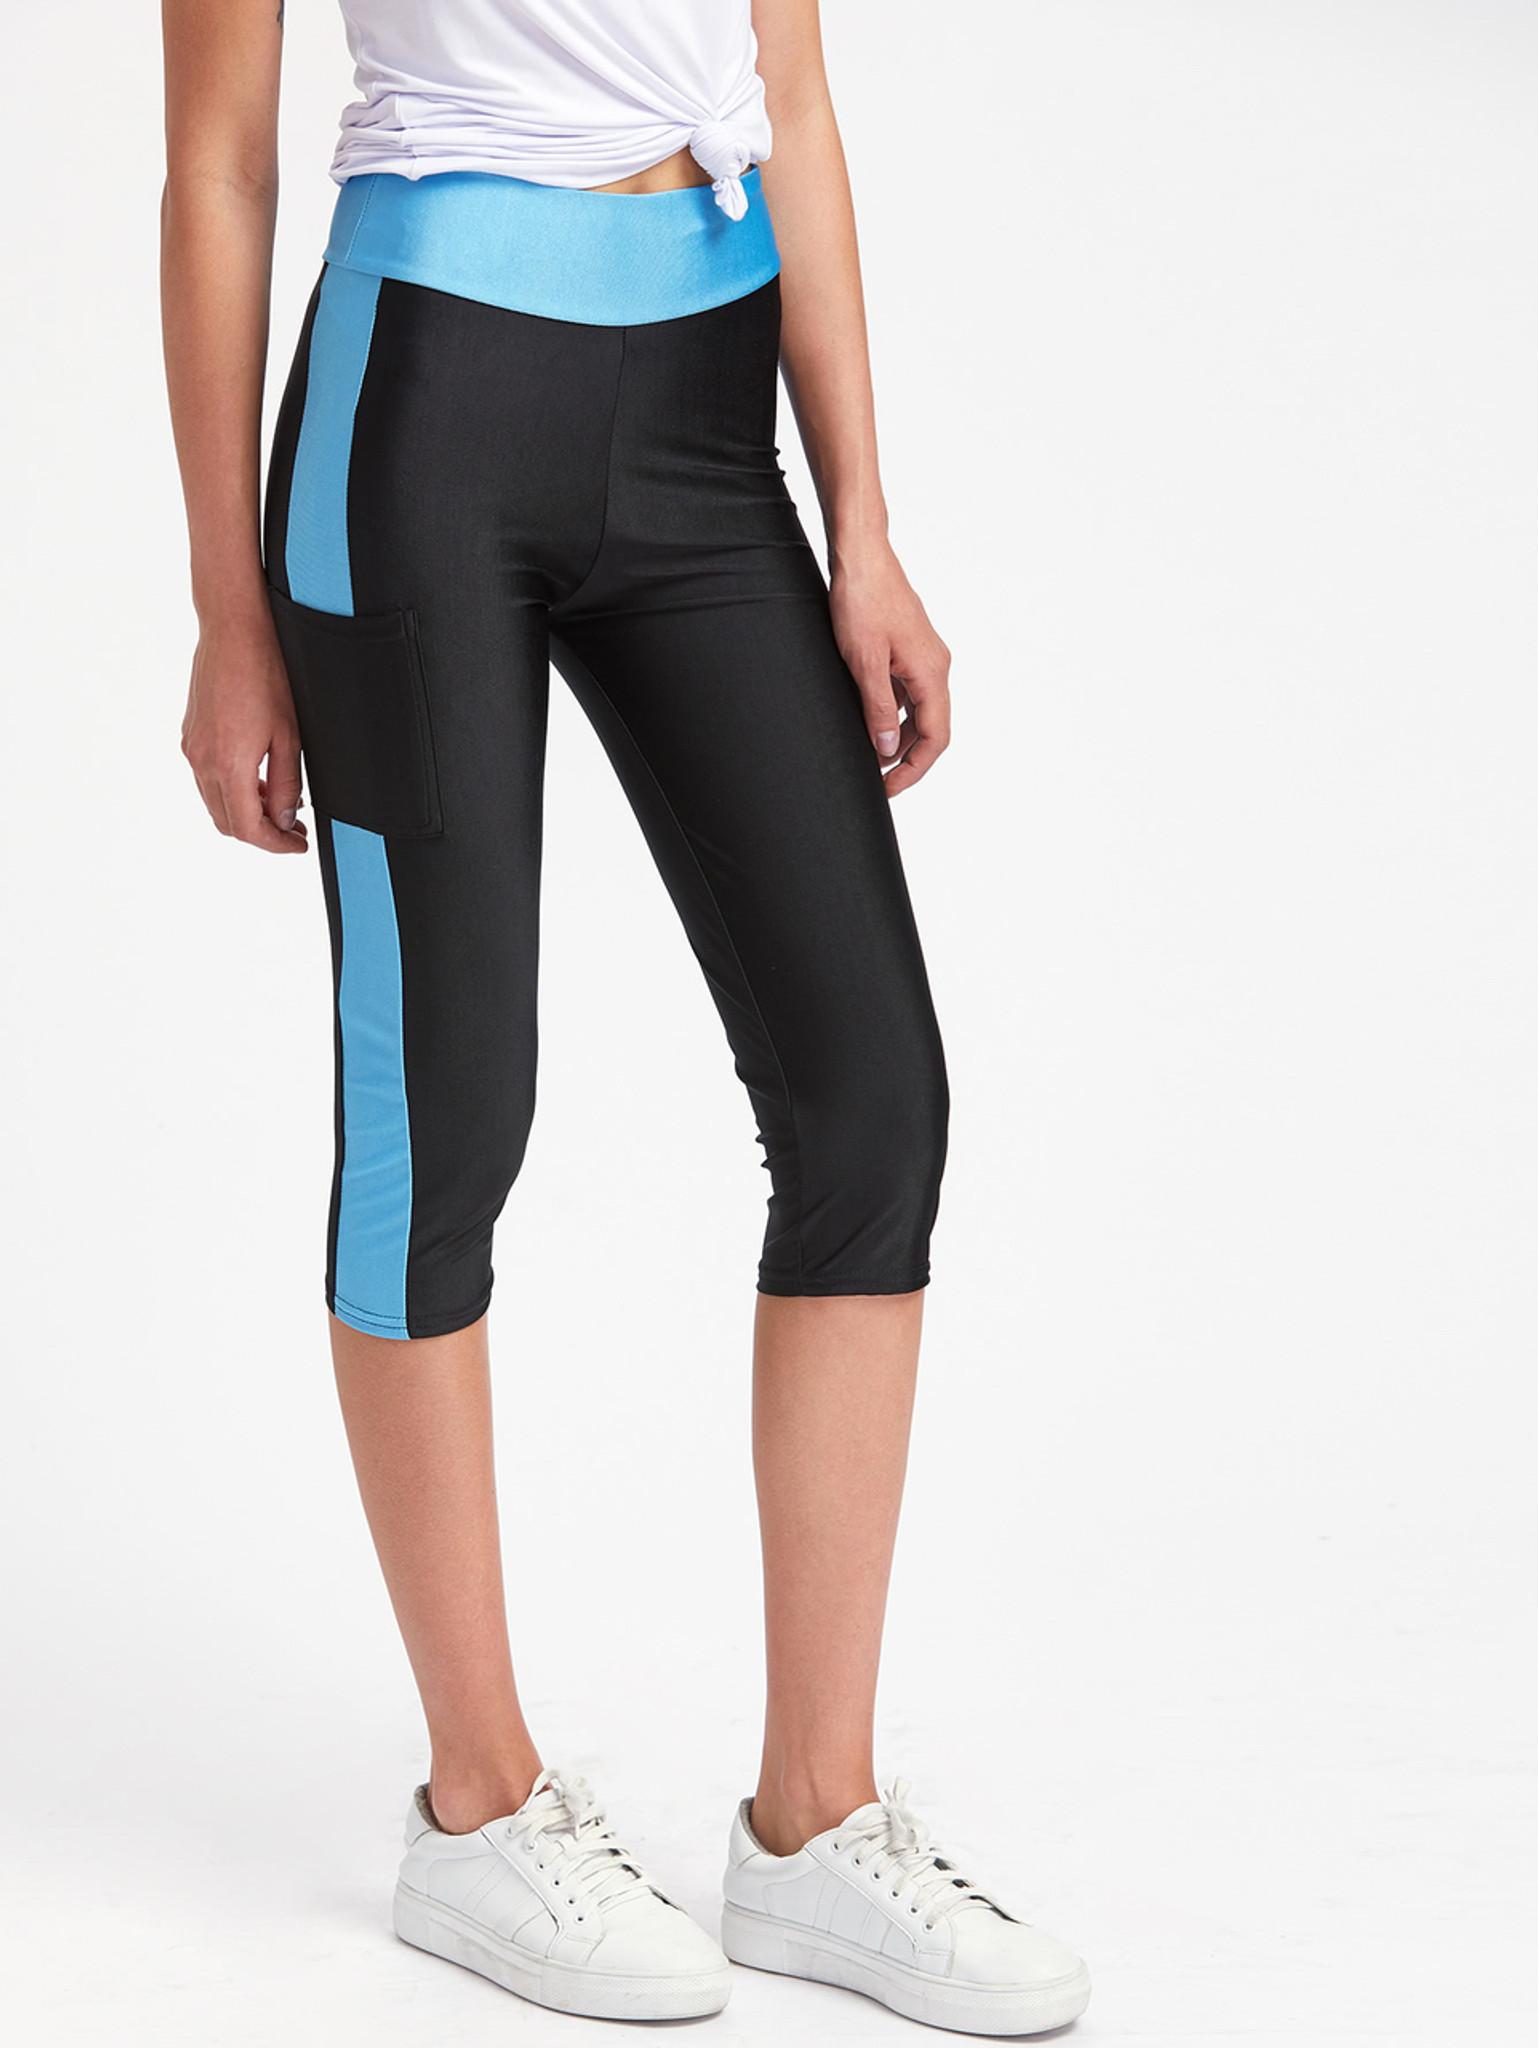 Fifth Avenue Color Block Pocket Capri Leggings - Black and Blue